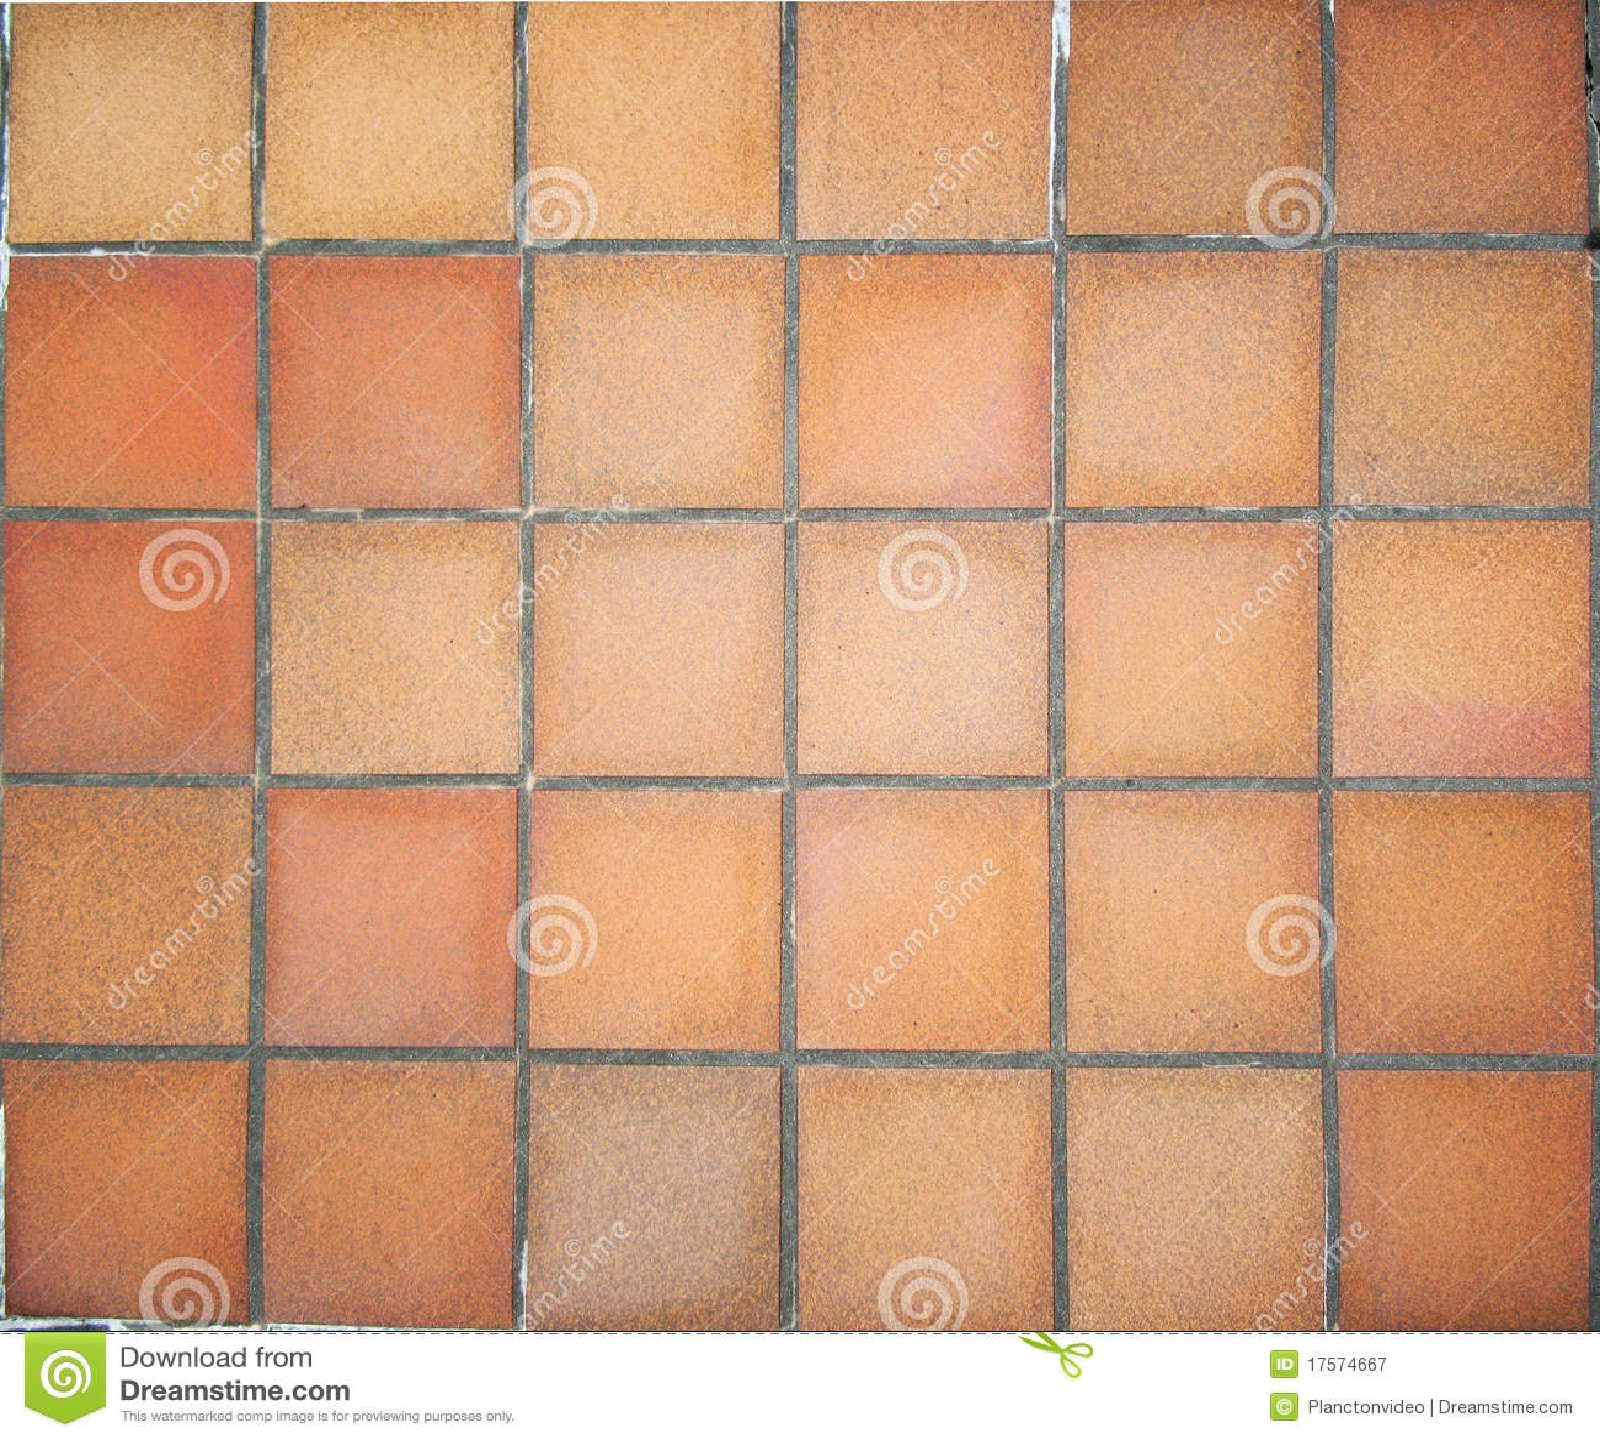 Terracotta Floor Tiles Stock Image Image Of Background